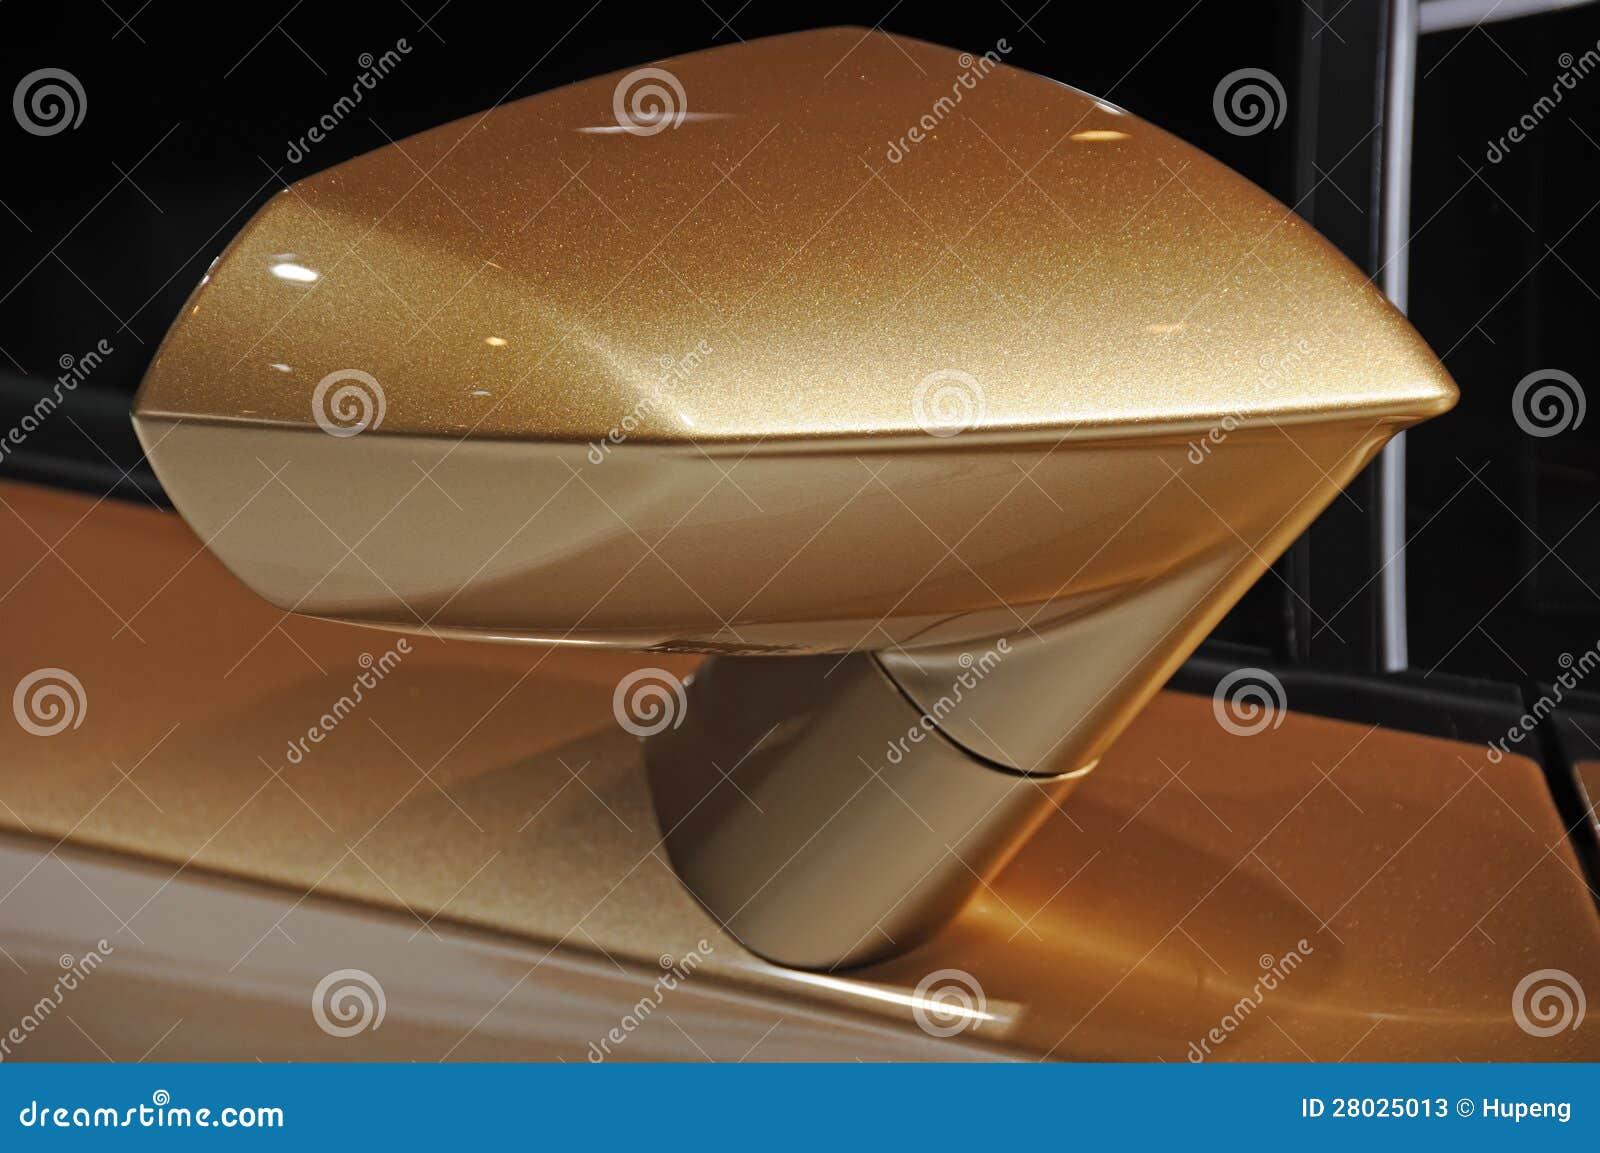 lamborghini car wing mirror stock photos image 28025013. Black Bedroom Furniture Sets. Home Design Ideas